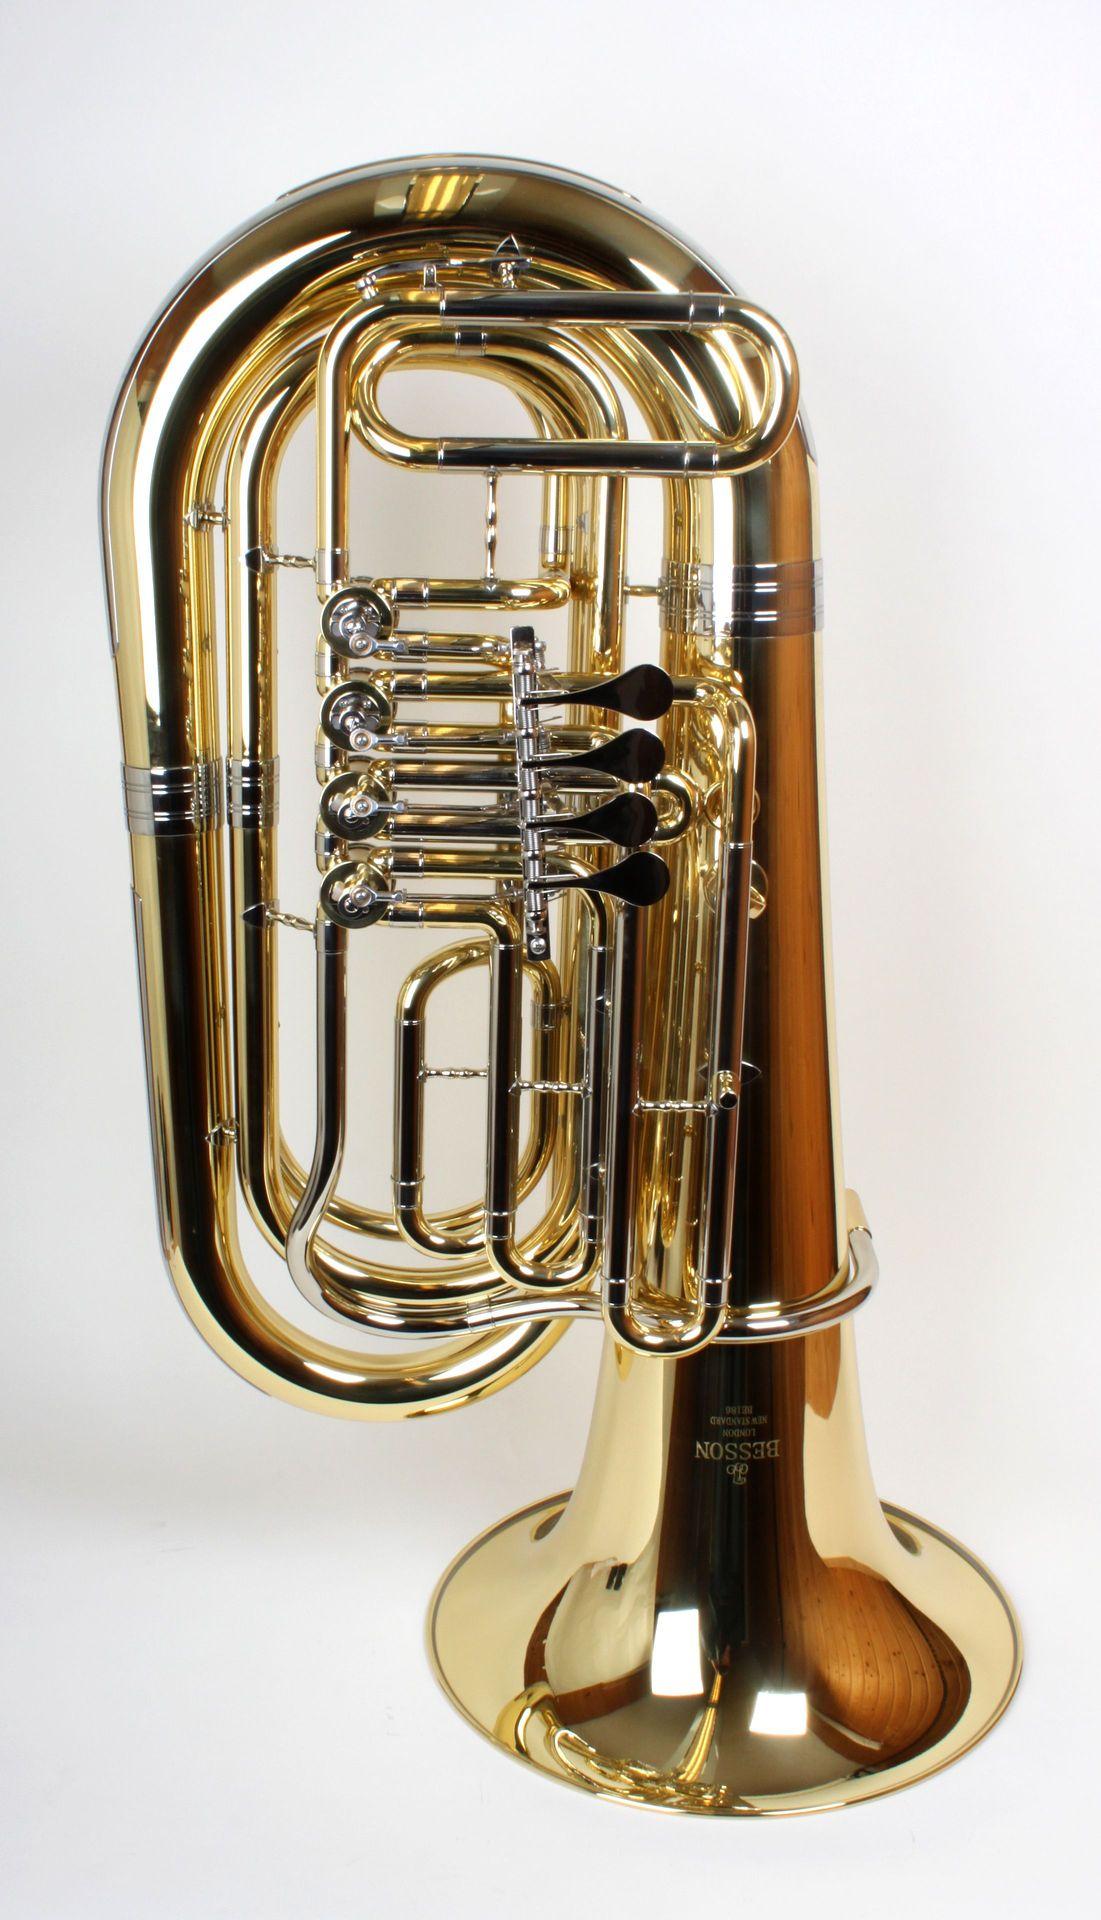 Besson 186 Tuba, Bb-Tuba 1/4, Bohrung 16,00mm, 4 Ventile, Etui + Zubehör 186-1-0